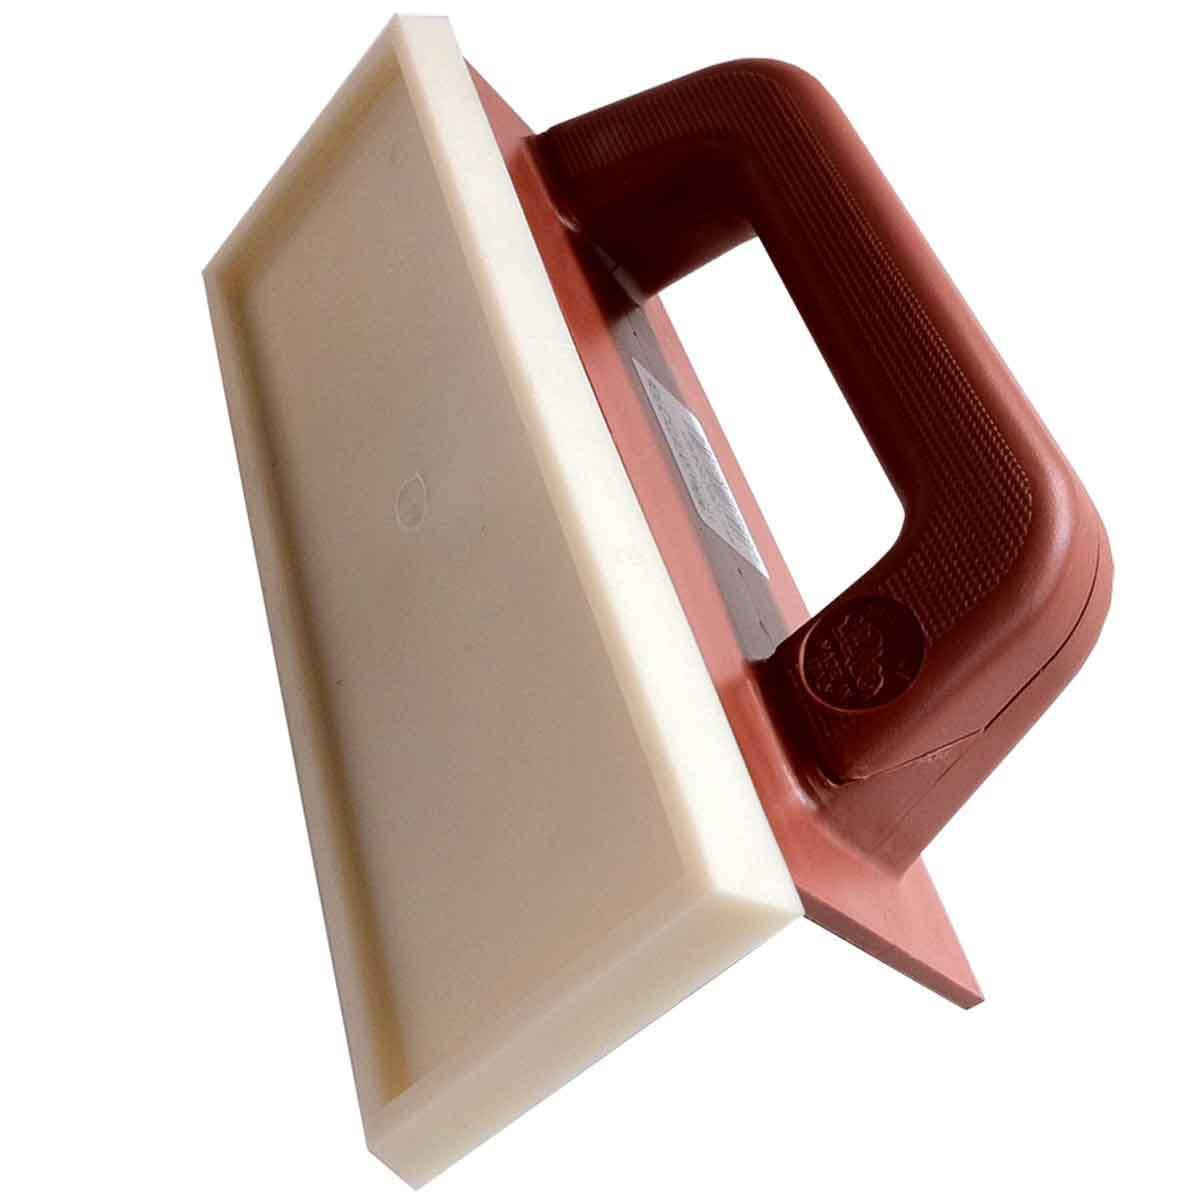 Raimondi Grout Float pad handle